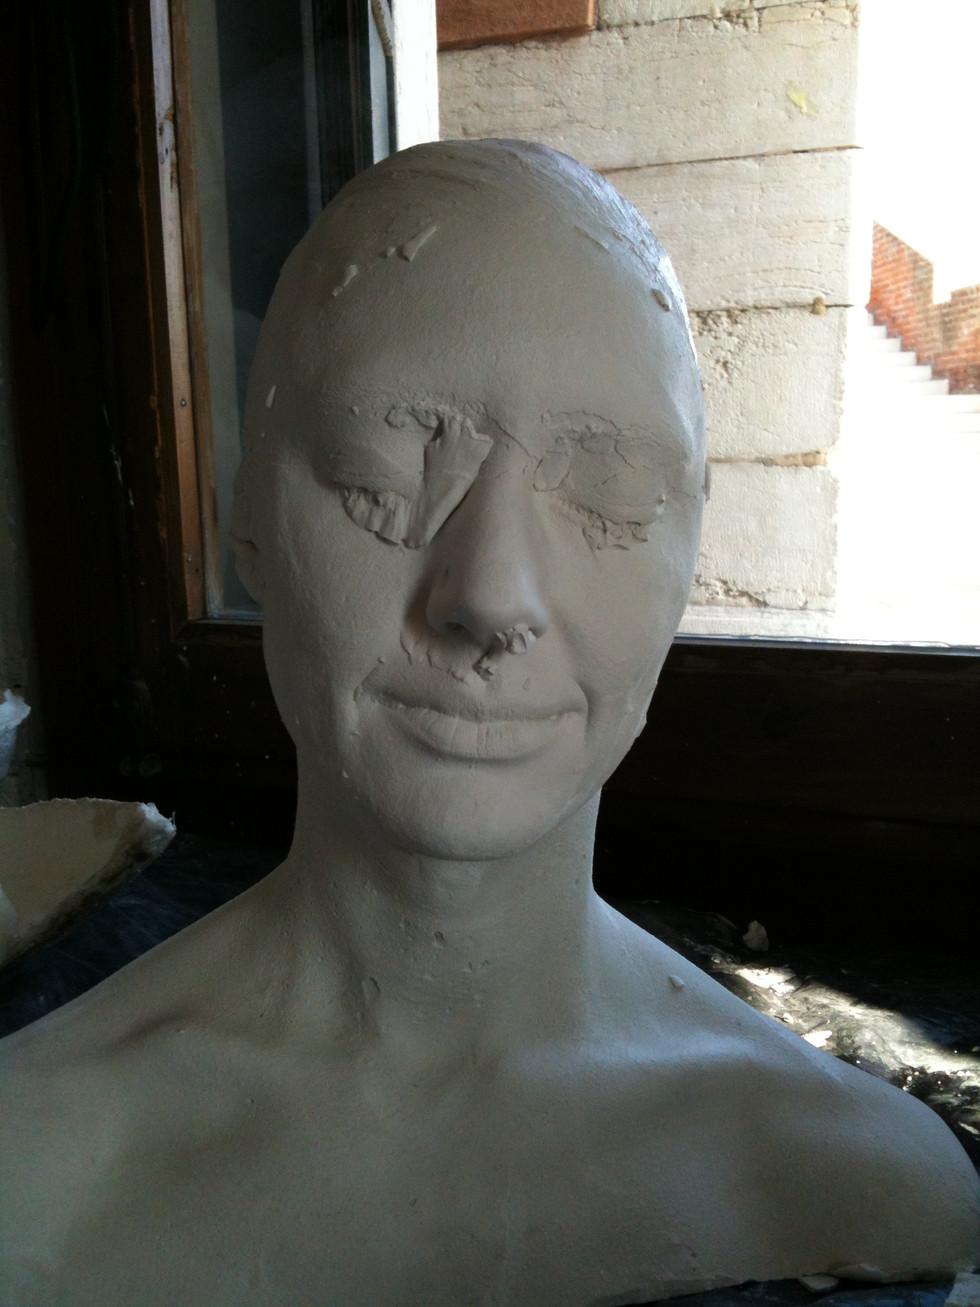 aledima-head casting 22.JPG